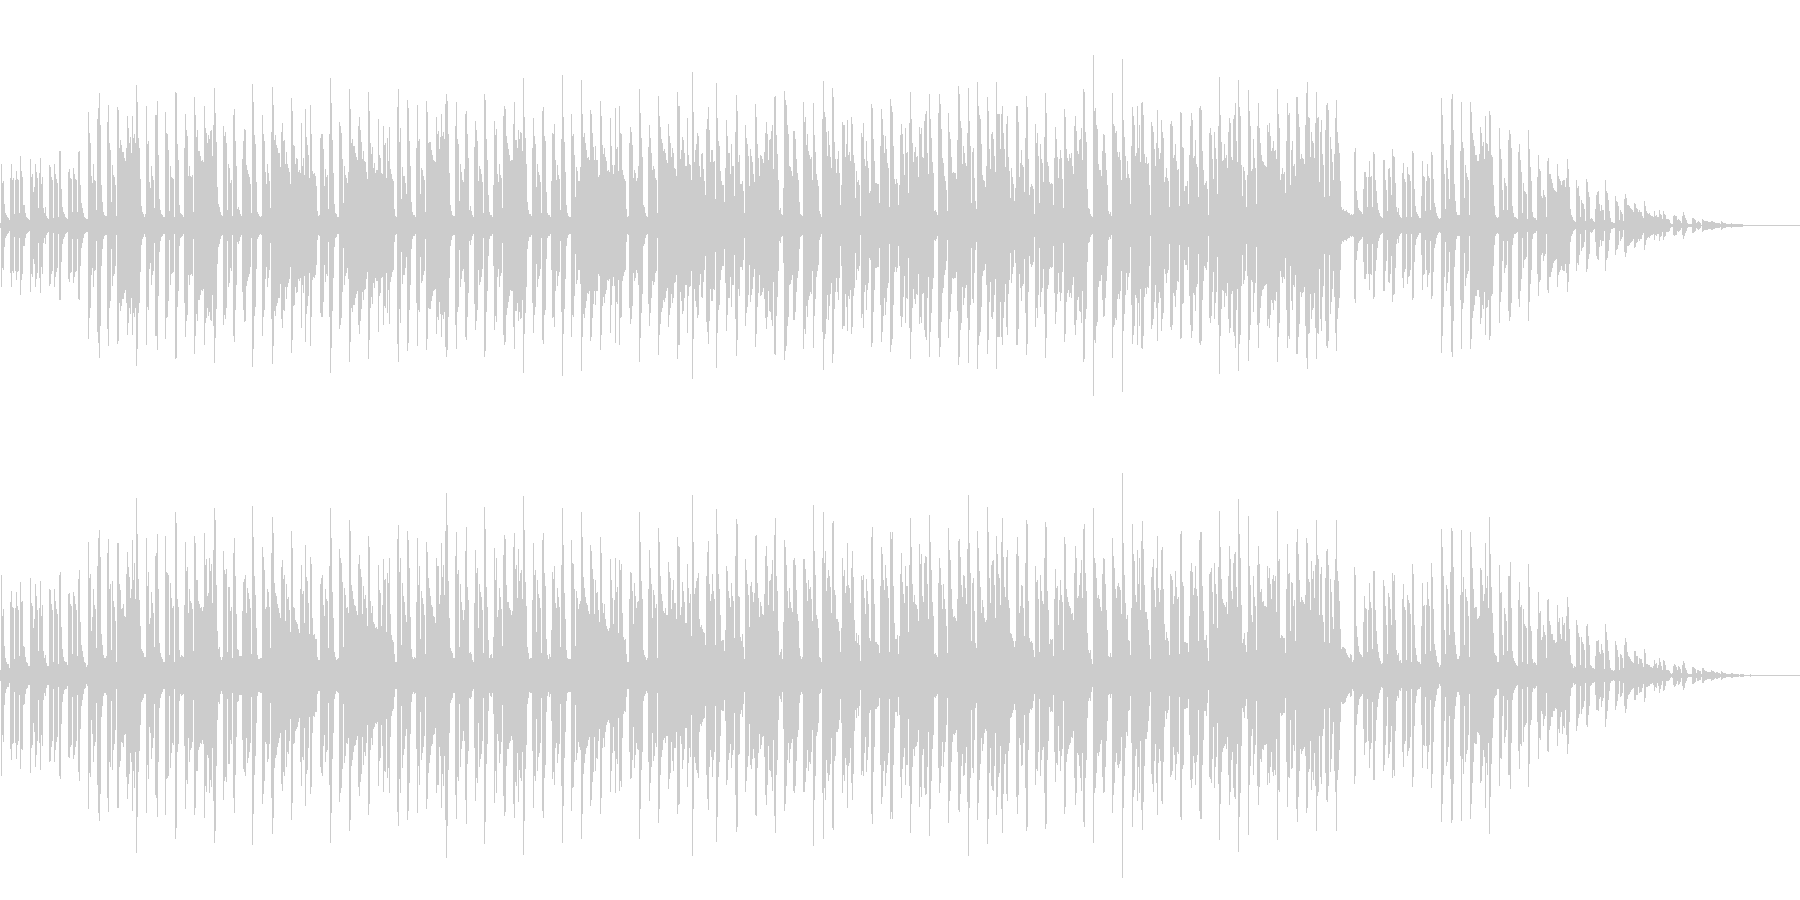 8bitクラシック-小さな白鳥たちの踊りの未再生の波形